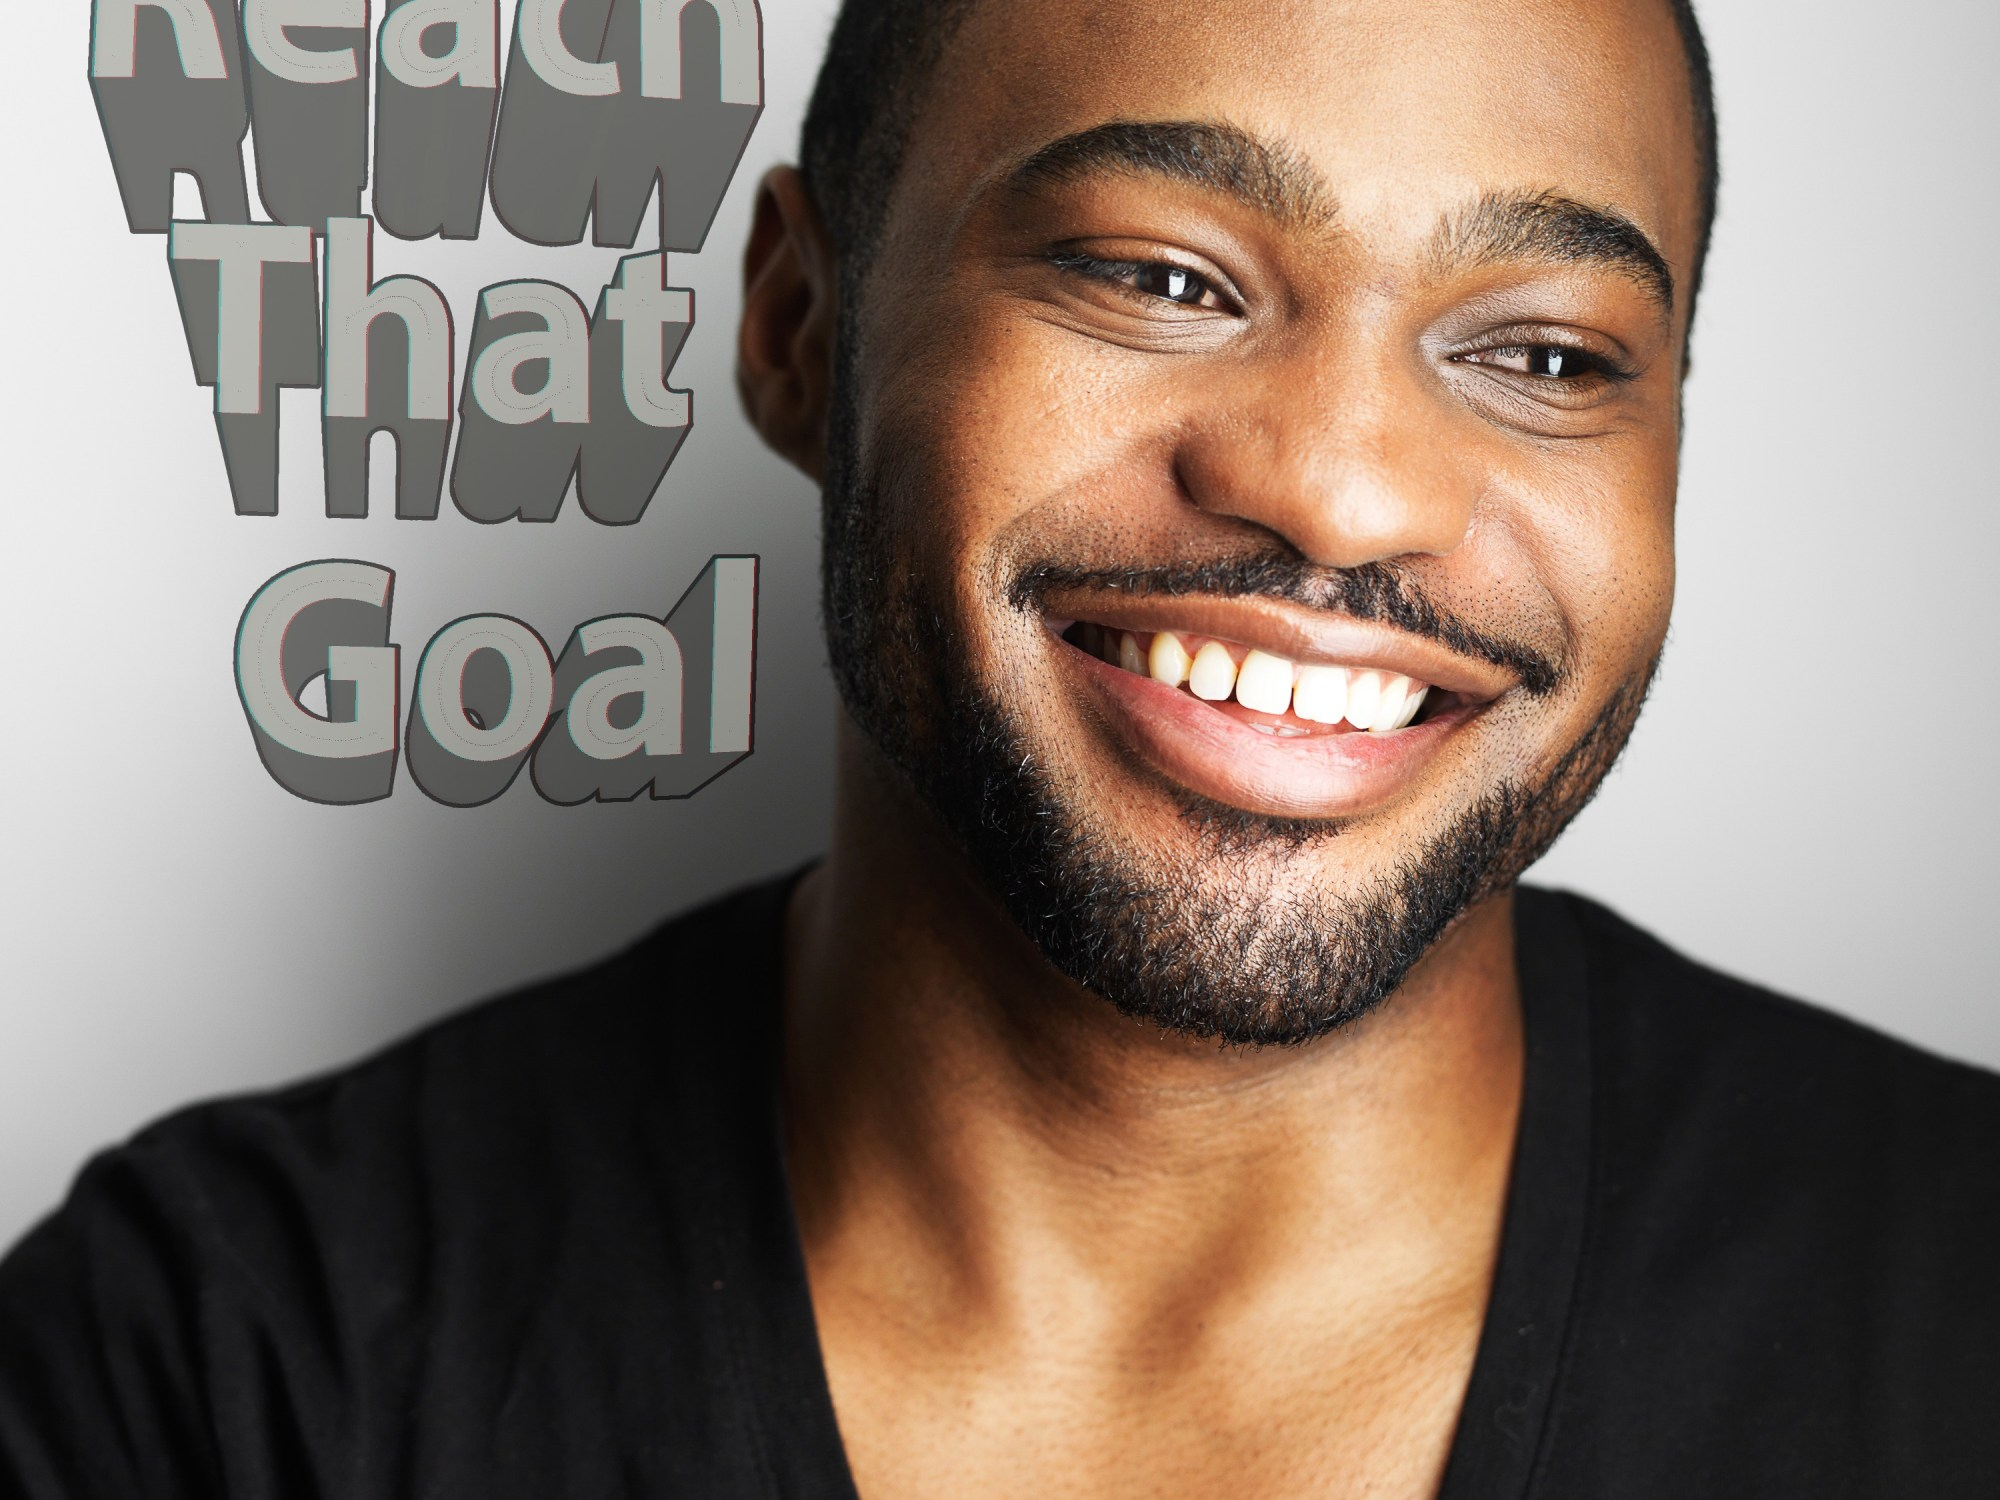 Reach That Goal - Tyrone Smith